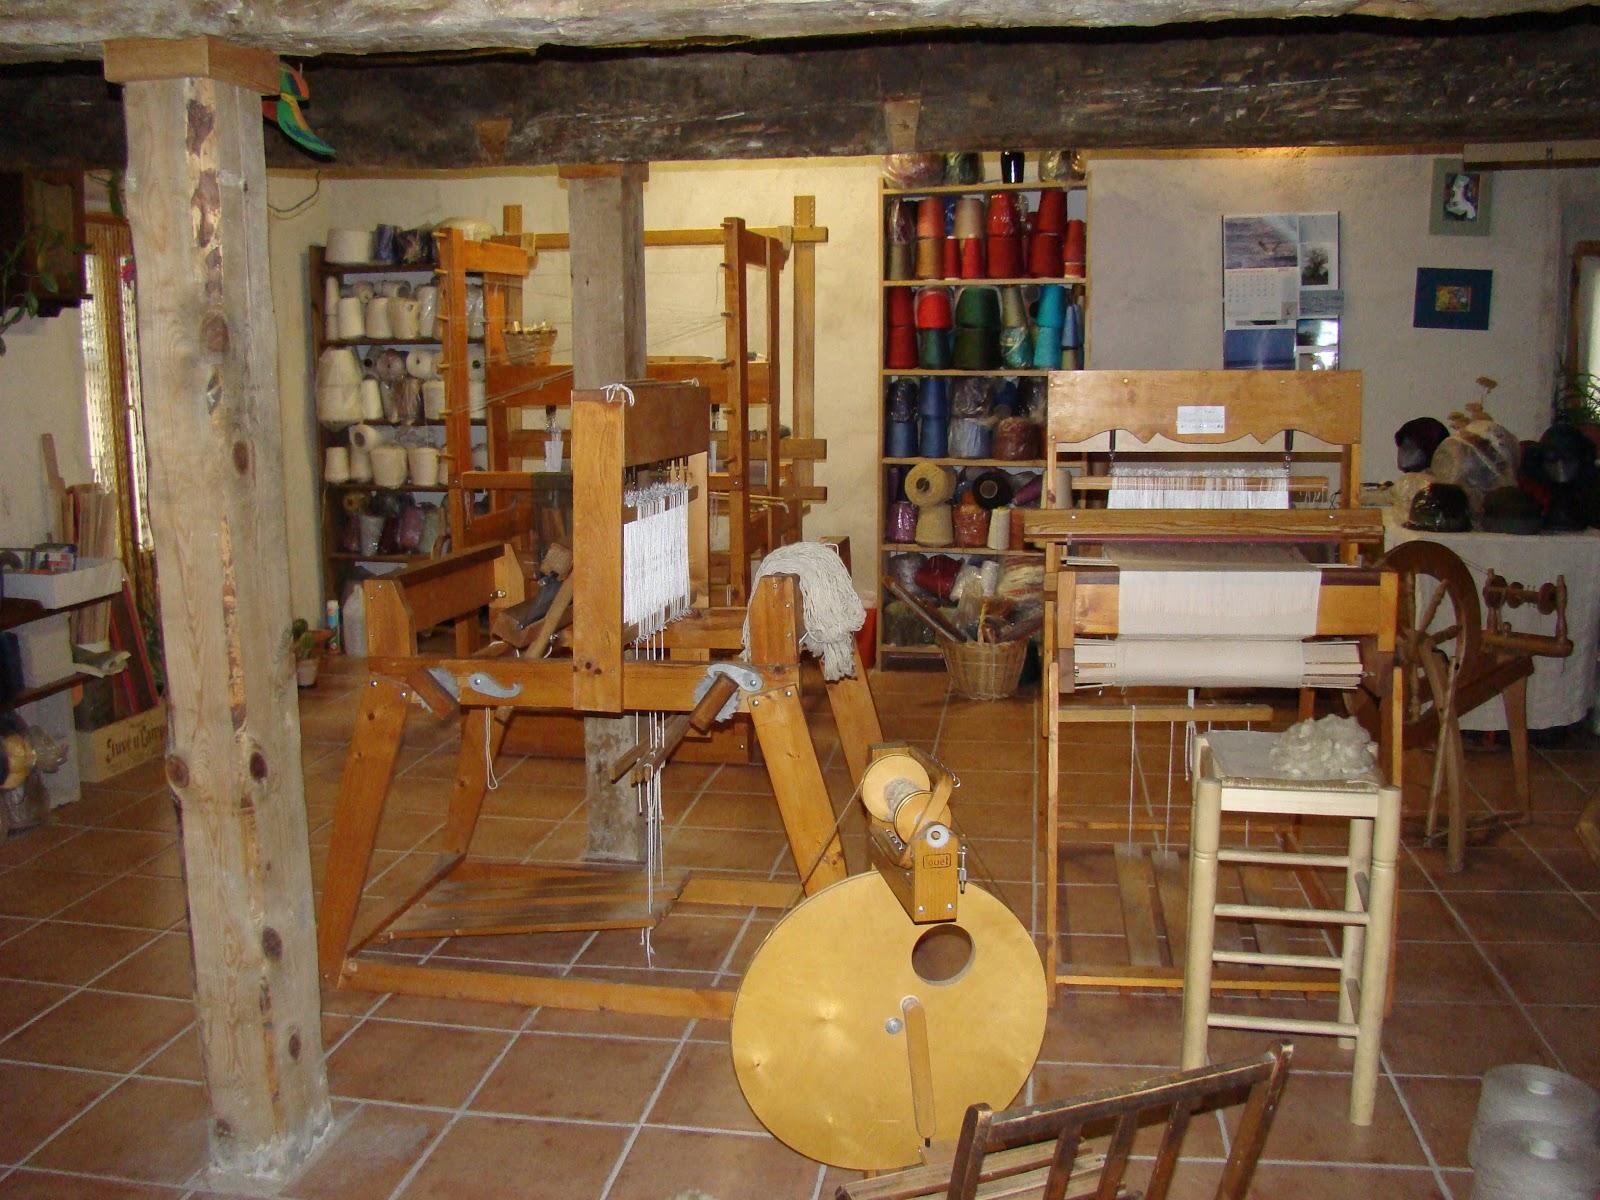 Barriuso textil el taller for Talleres artesanales